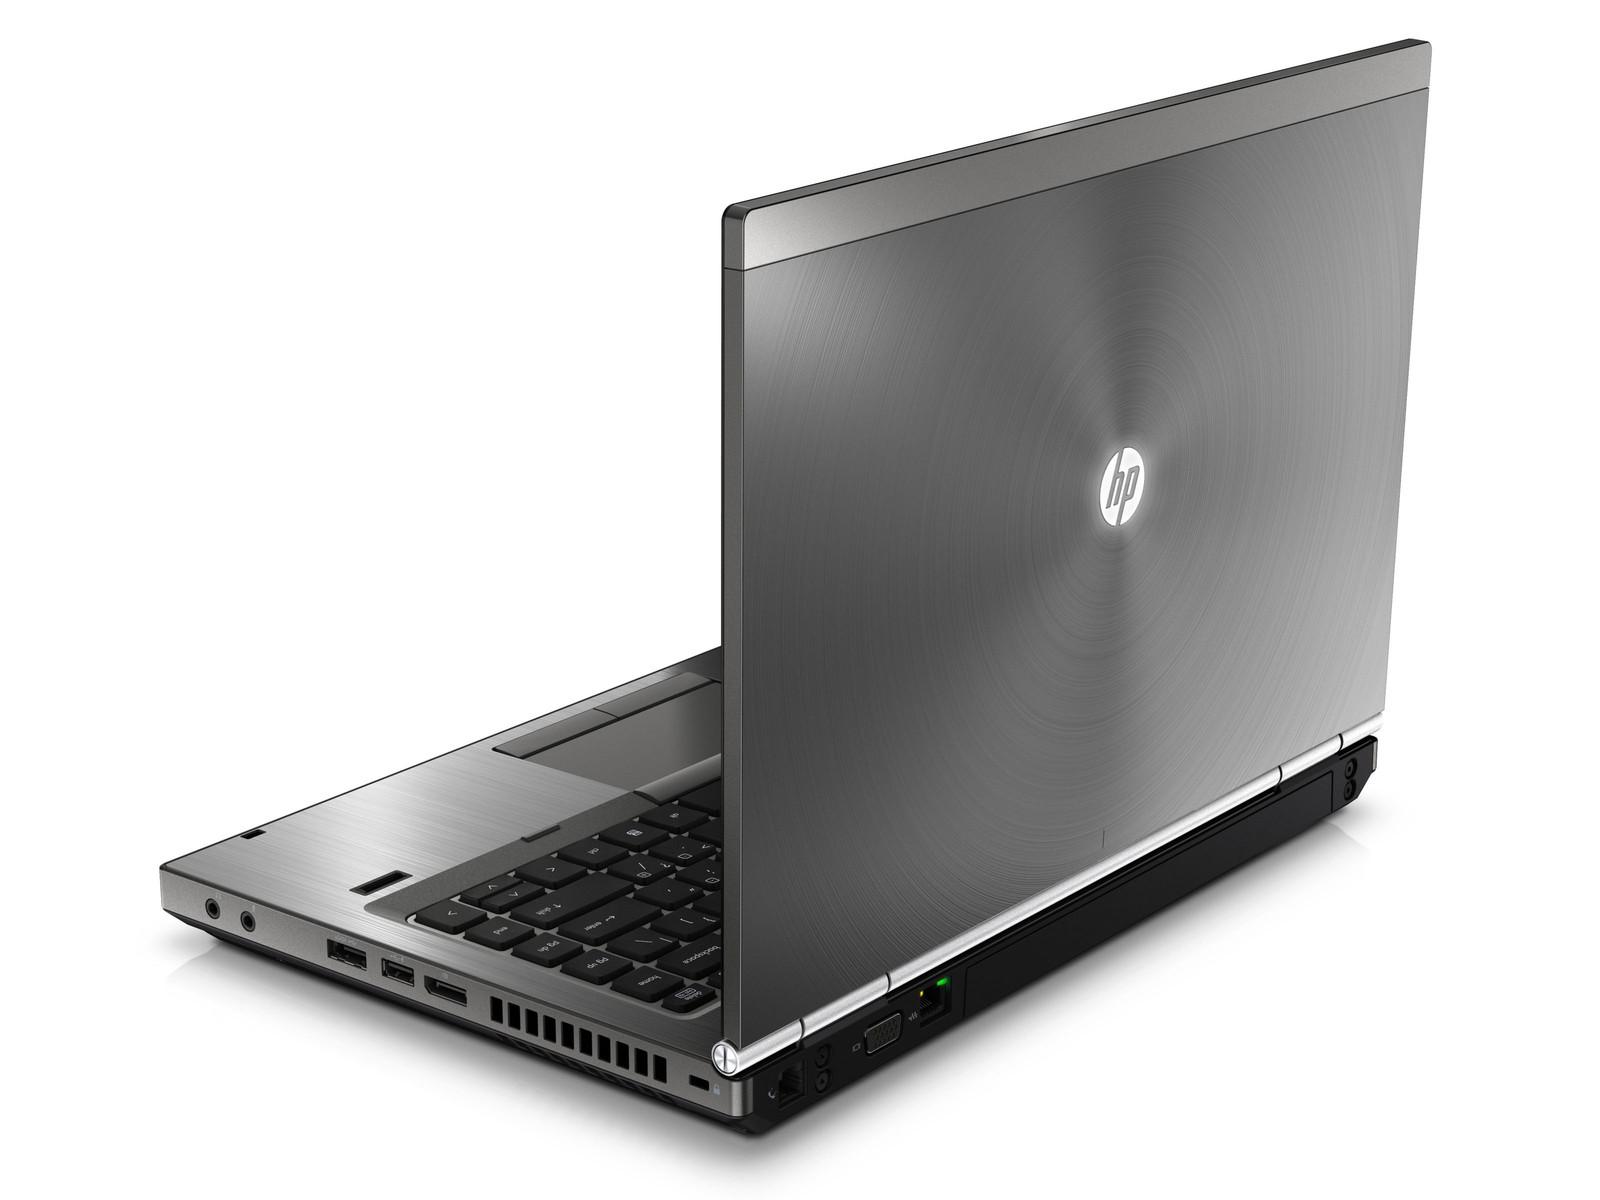 Hp notebook i7 price - Hp Elitebook 8460p I7 Price